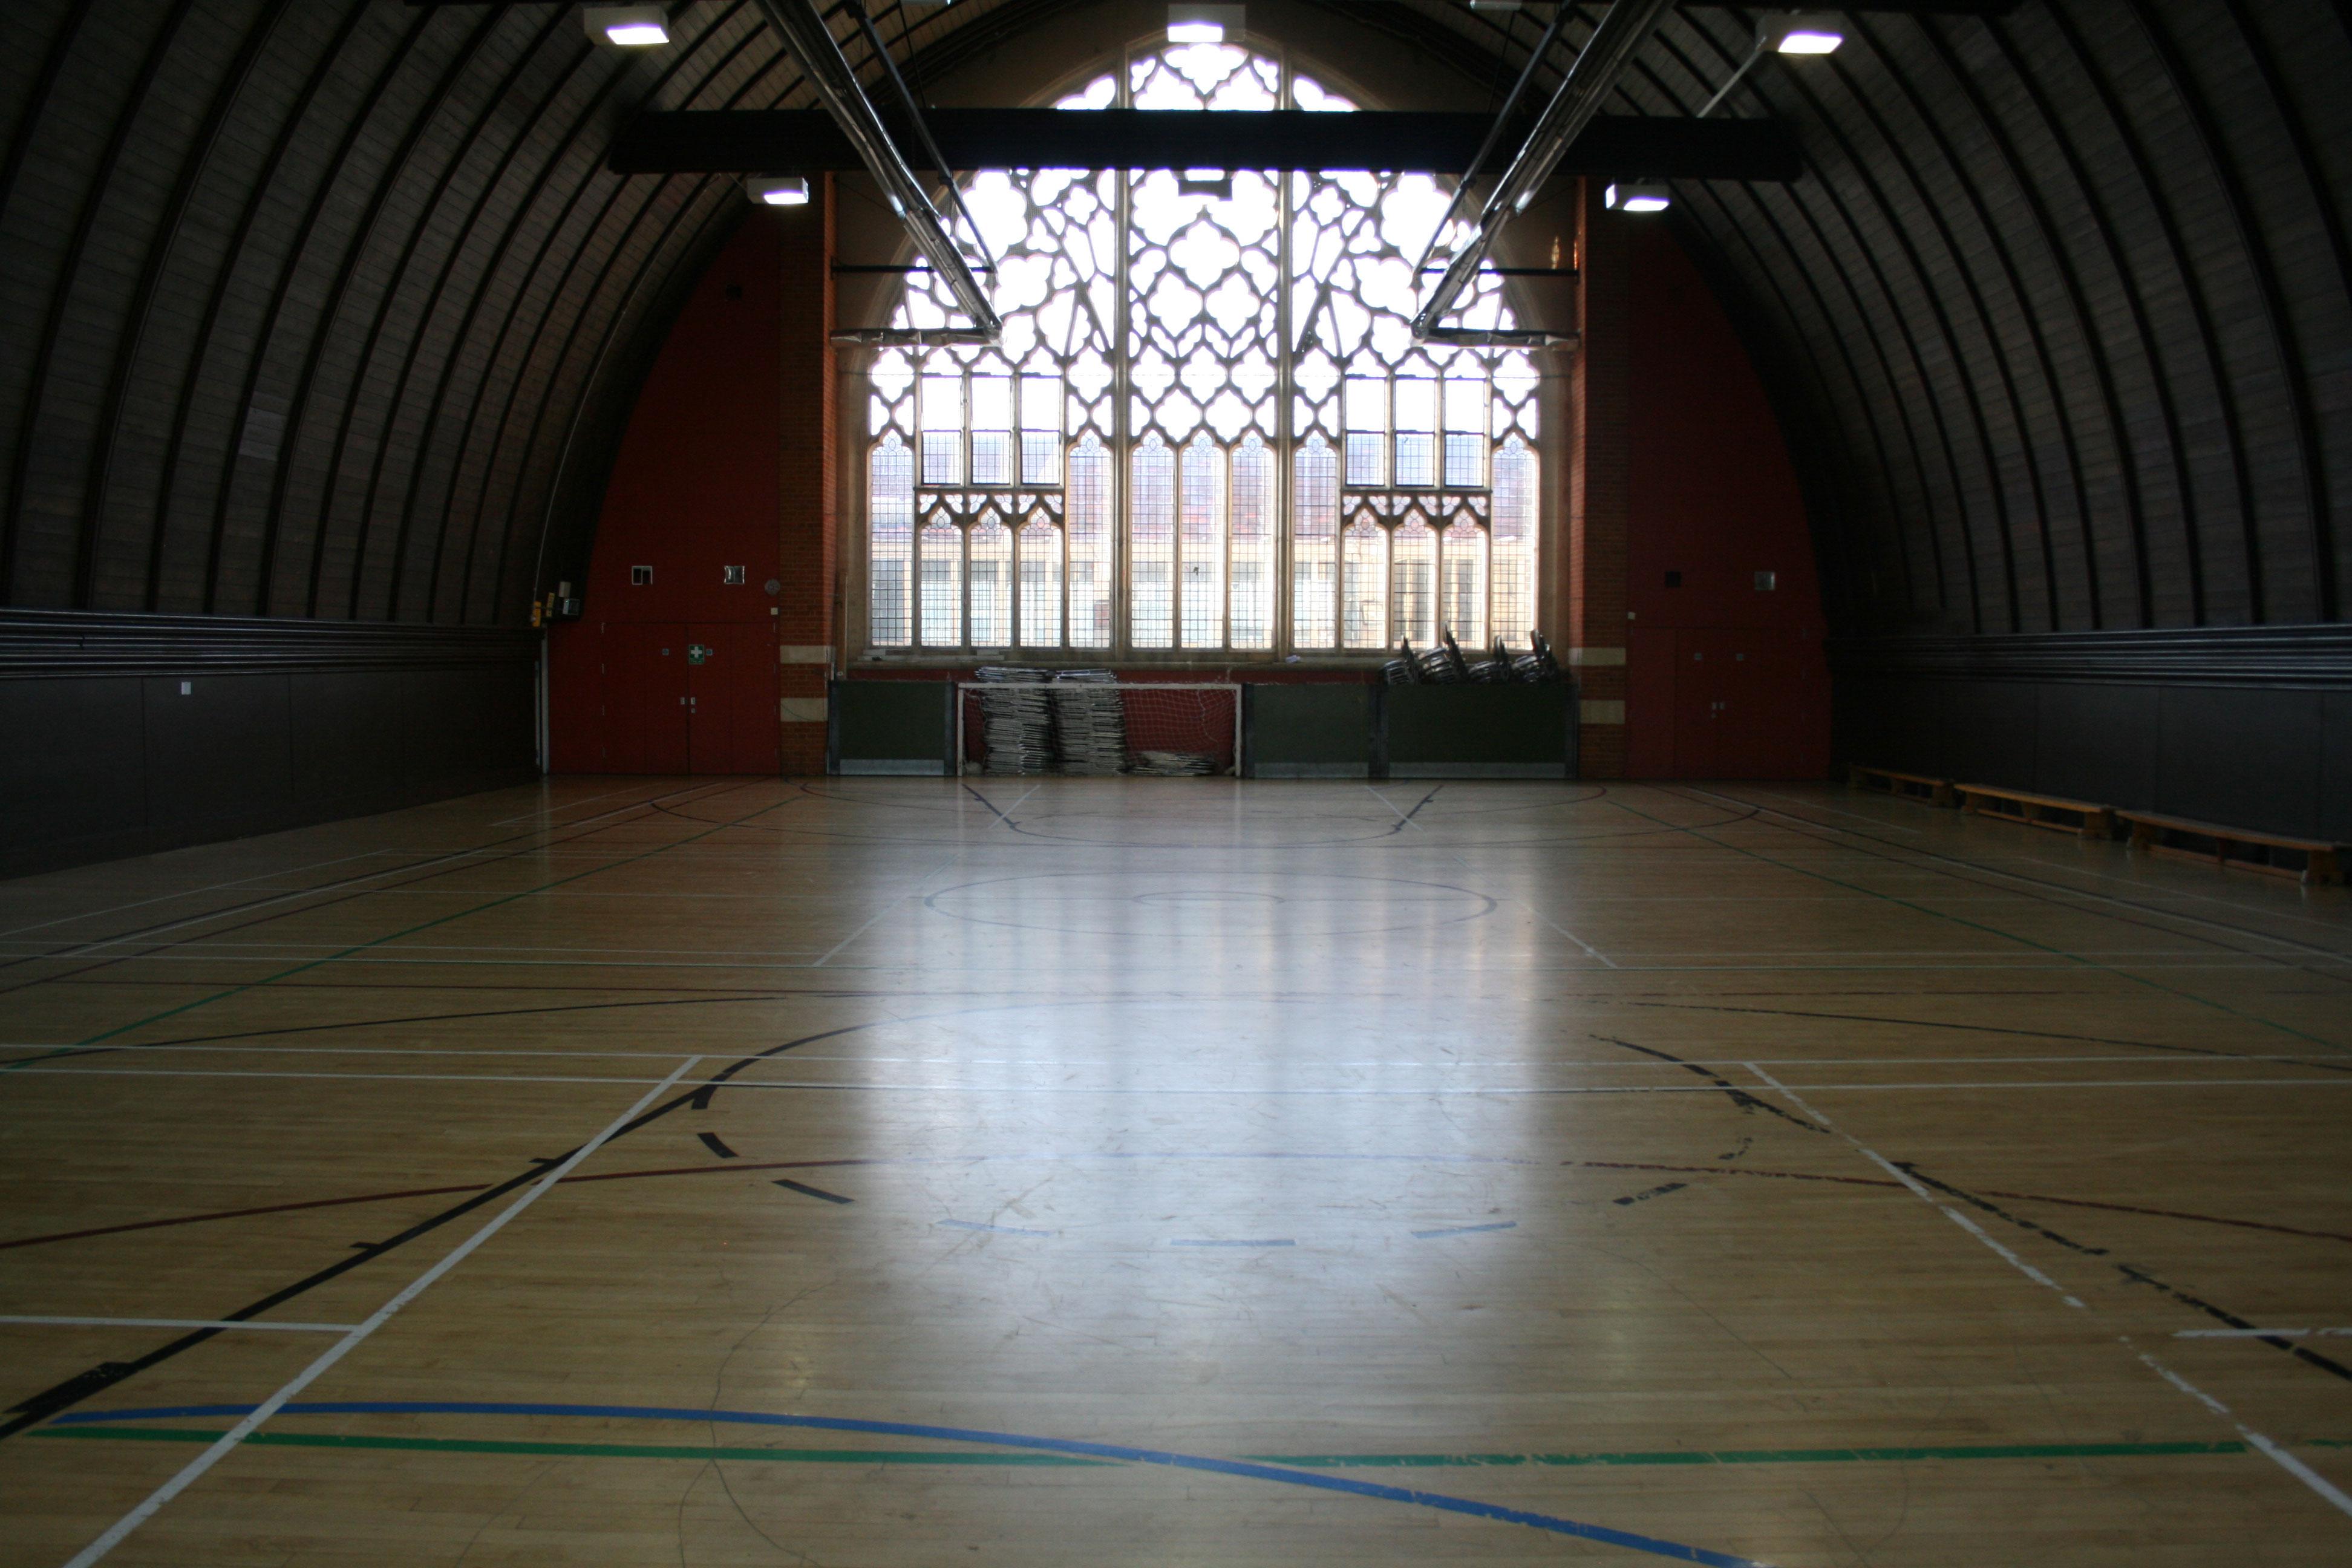 Sports Hall Harrow Club W10 Event Venue Hire